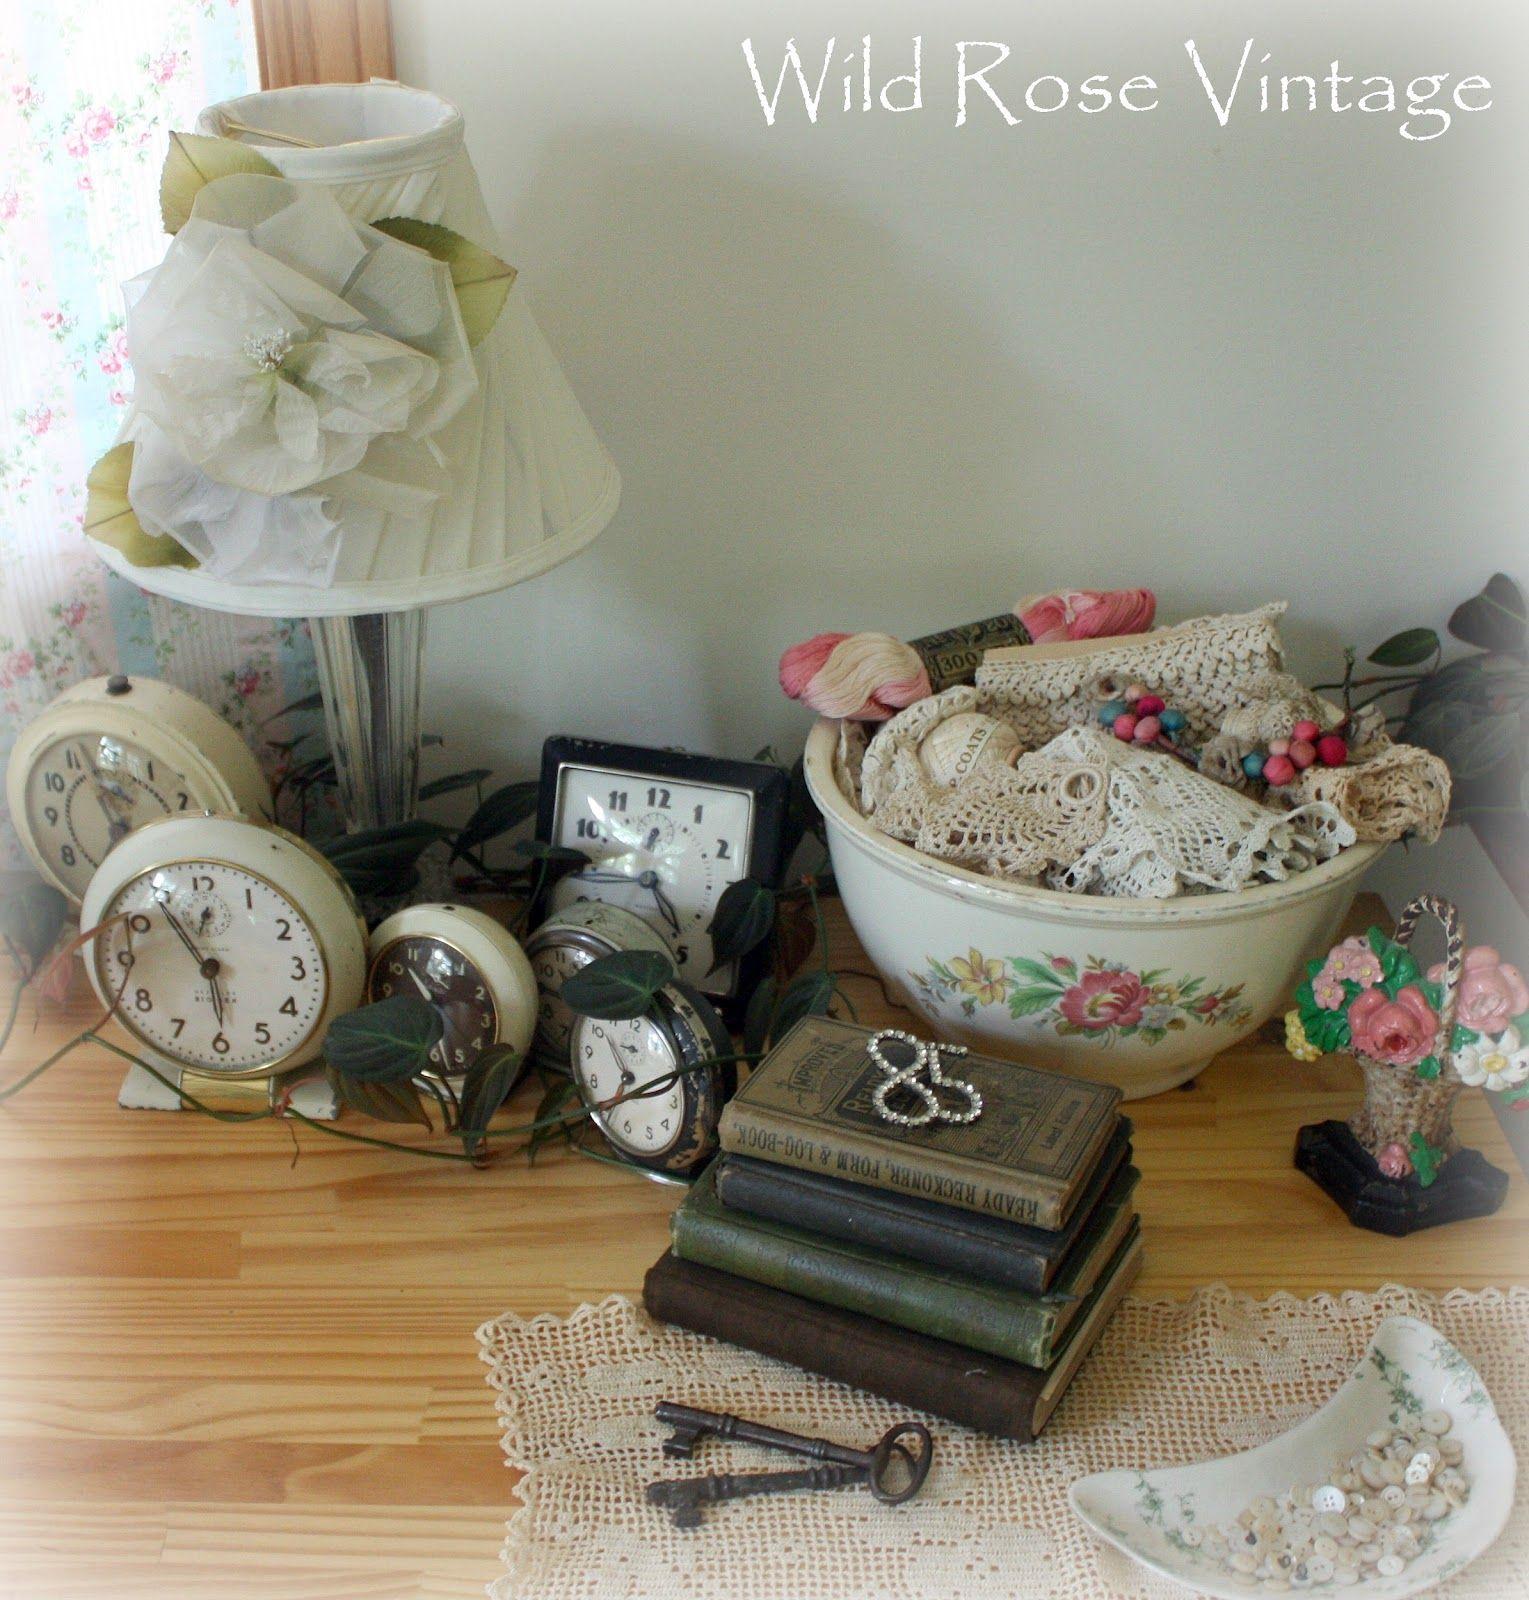 Wild Rose Vintage